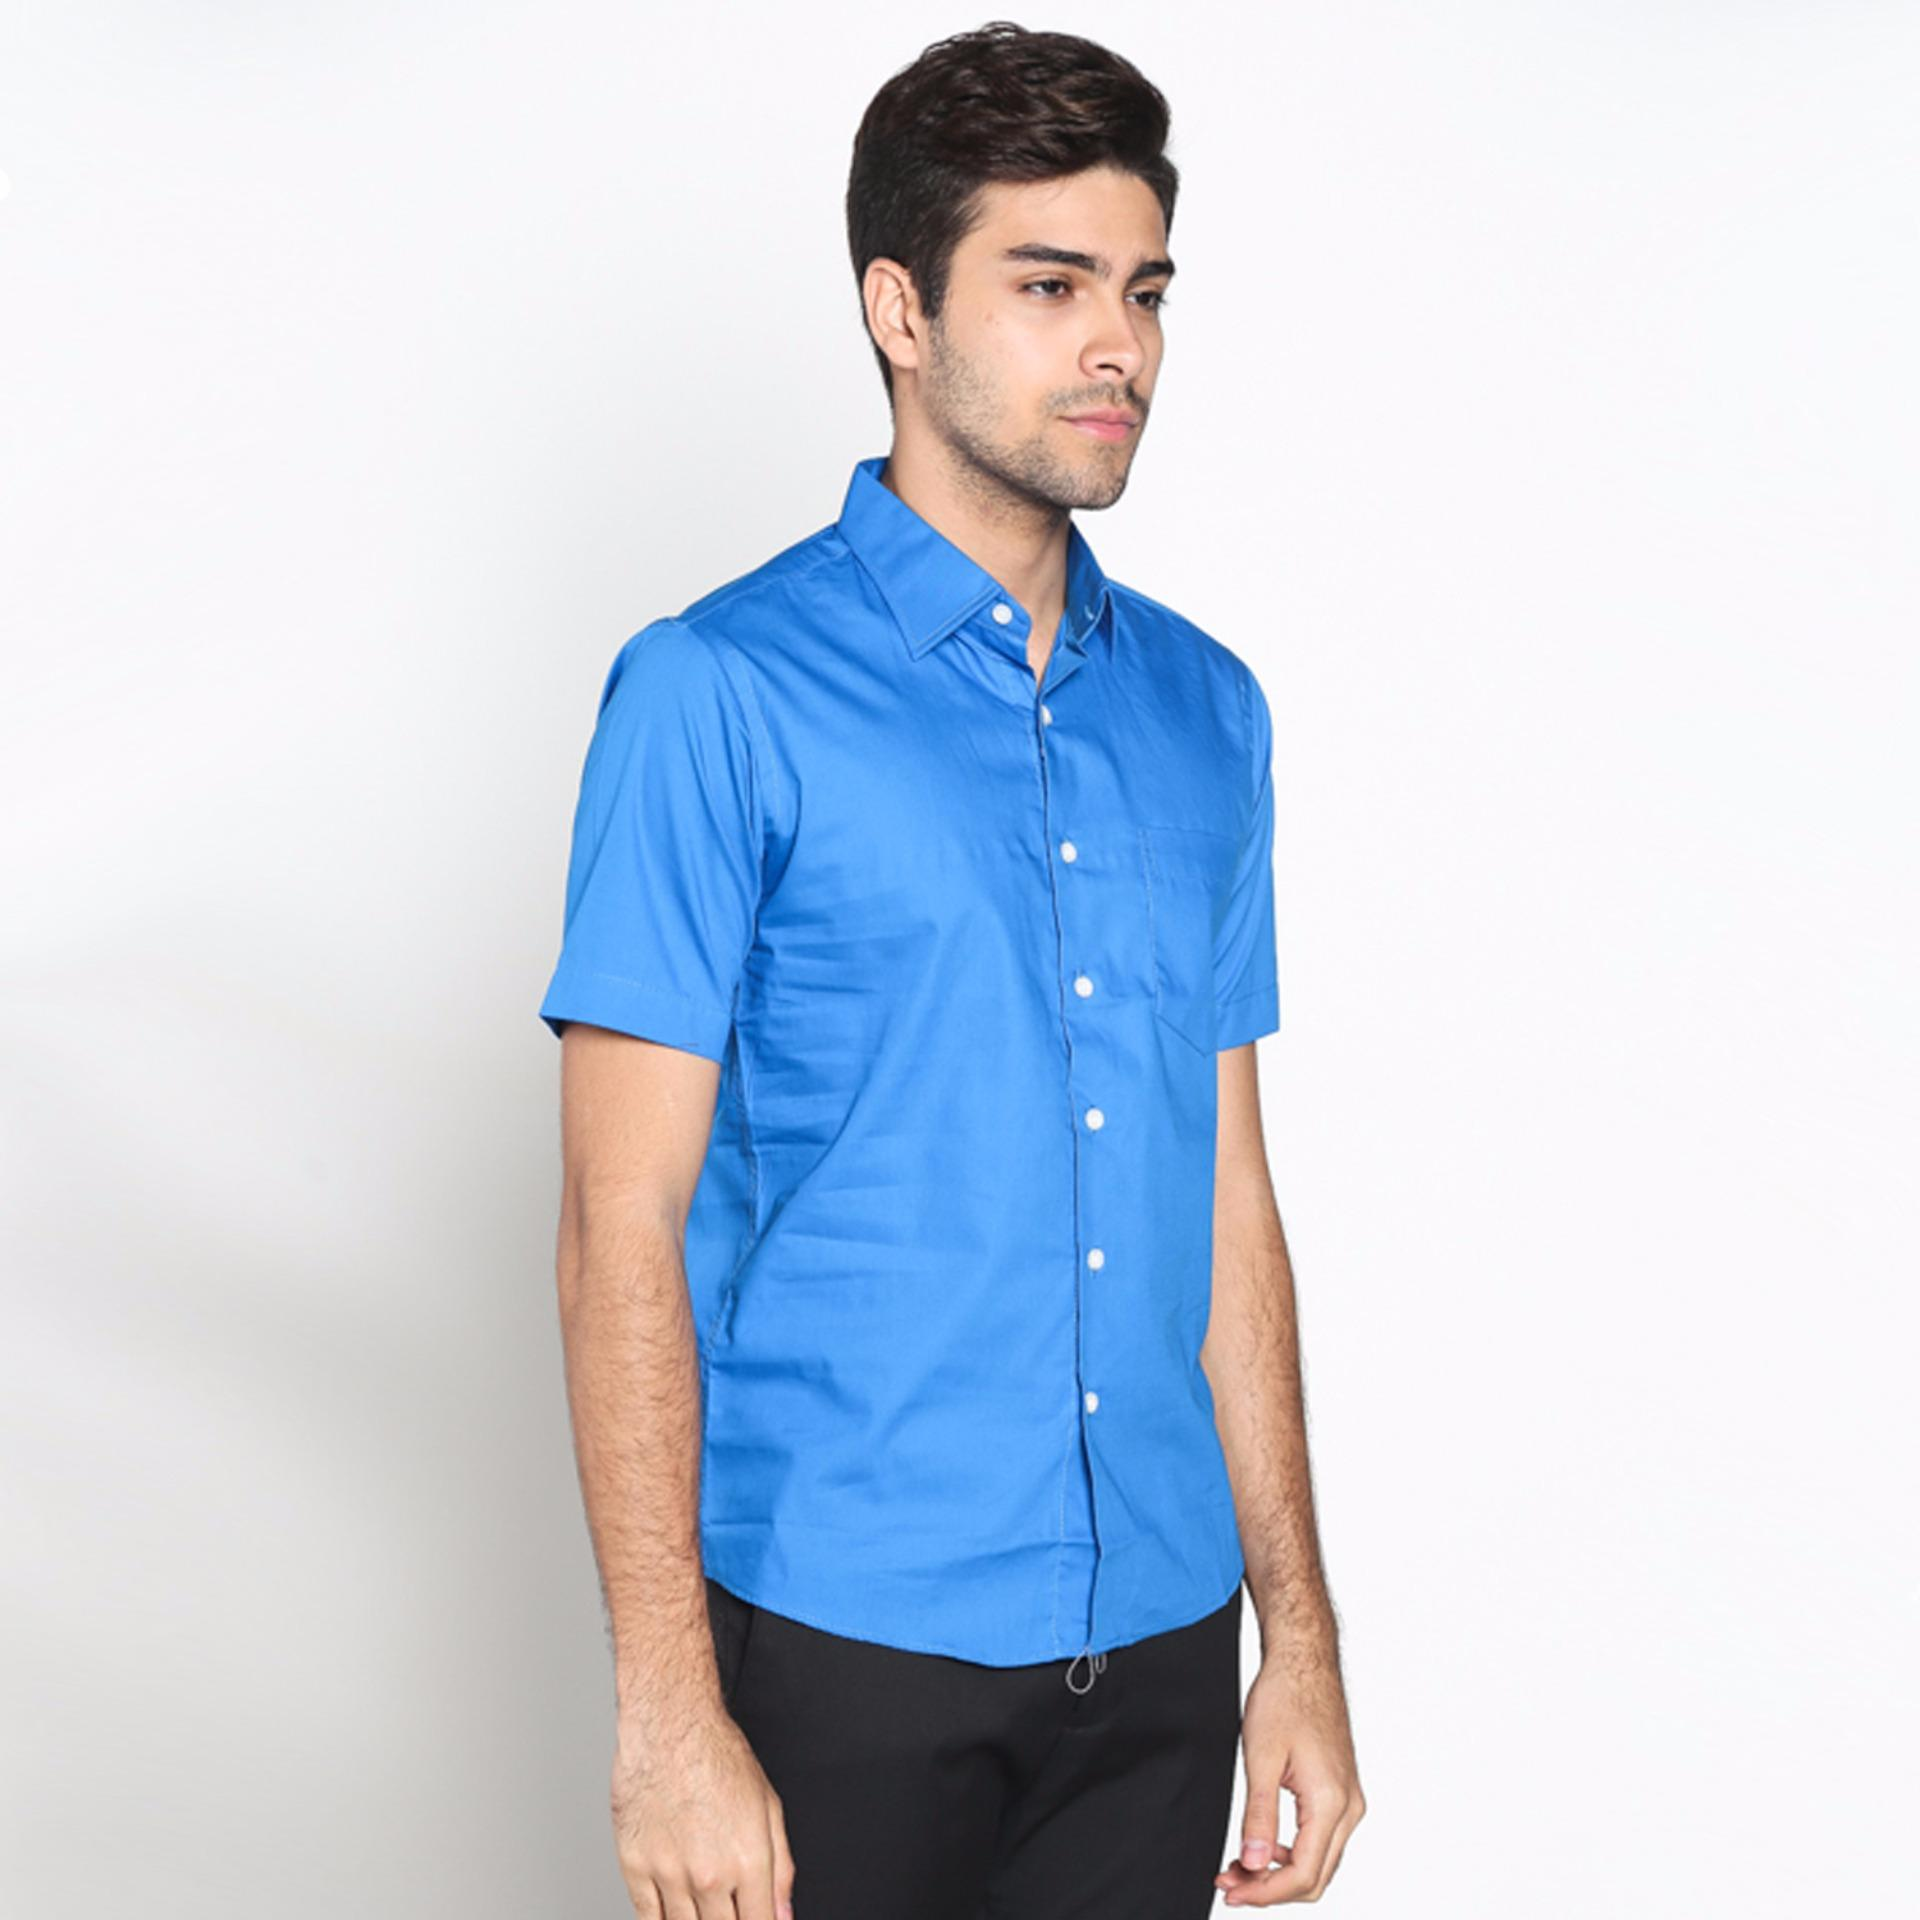 Vm Kemeja Formal Polos Slimfit Panjang Royal Blue Daftar Harga Fbw Clayton Long Sleeve Batik Shirt Cokelat Pendek Biru Slim